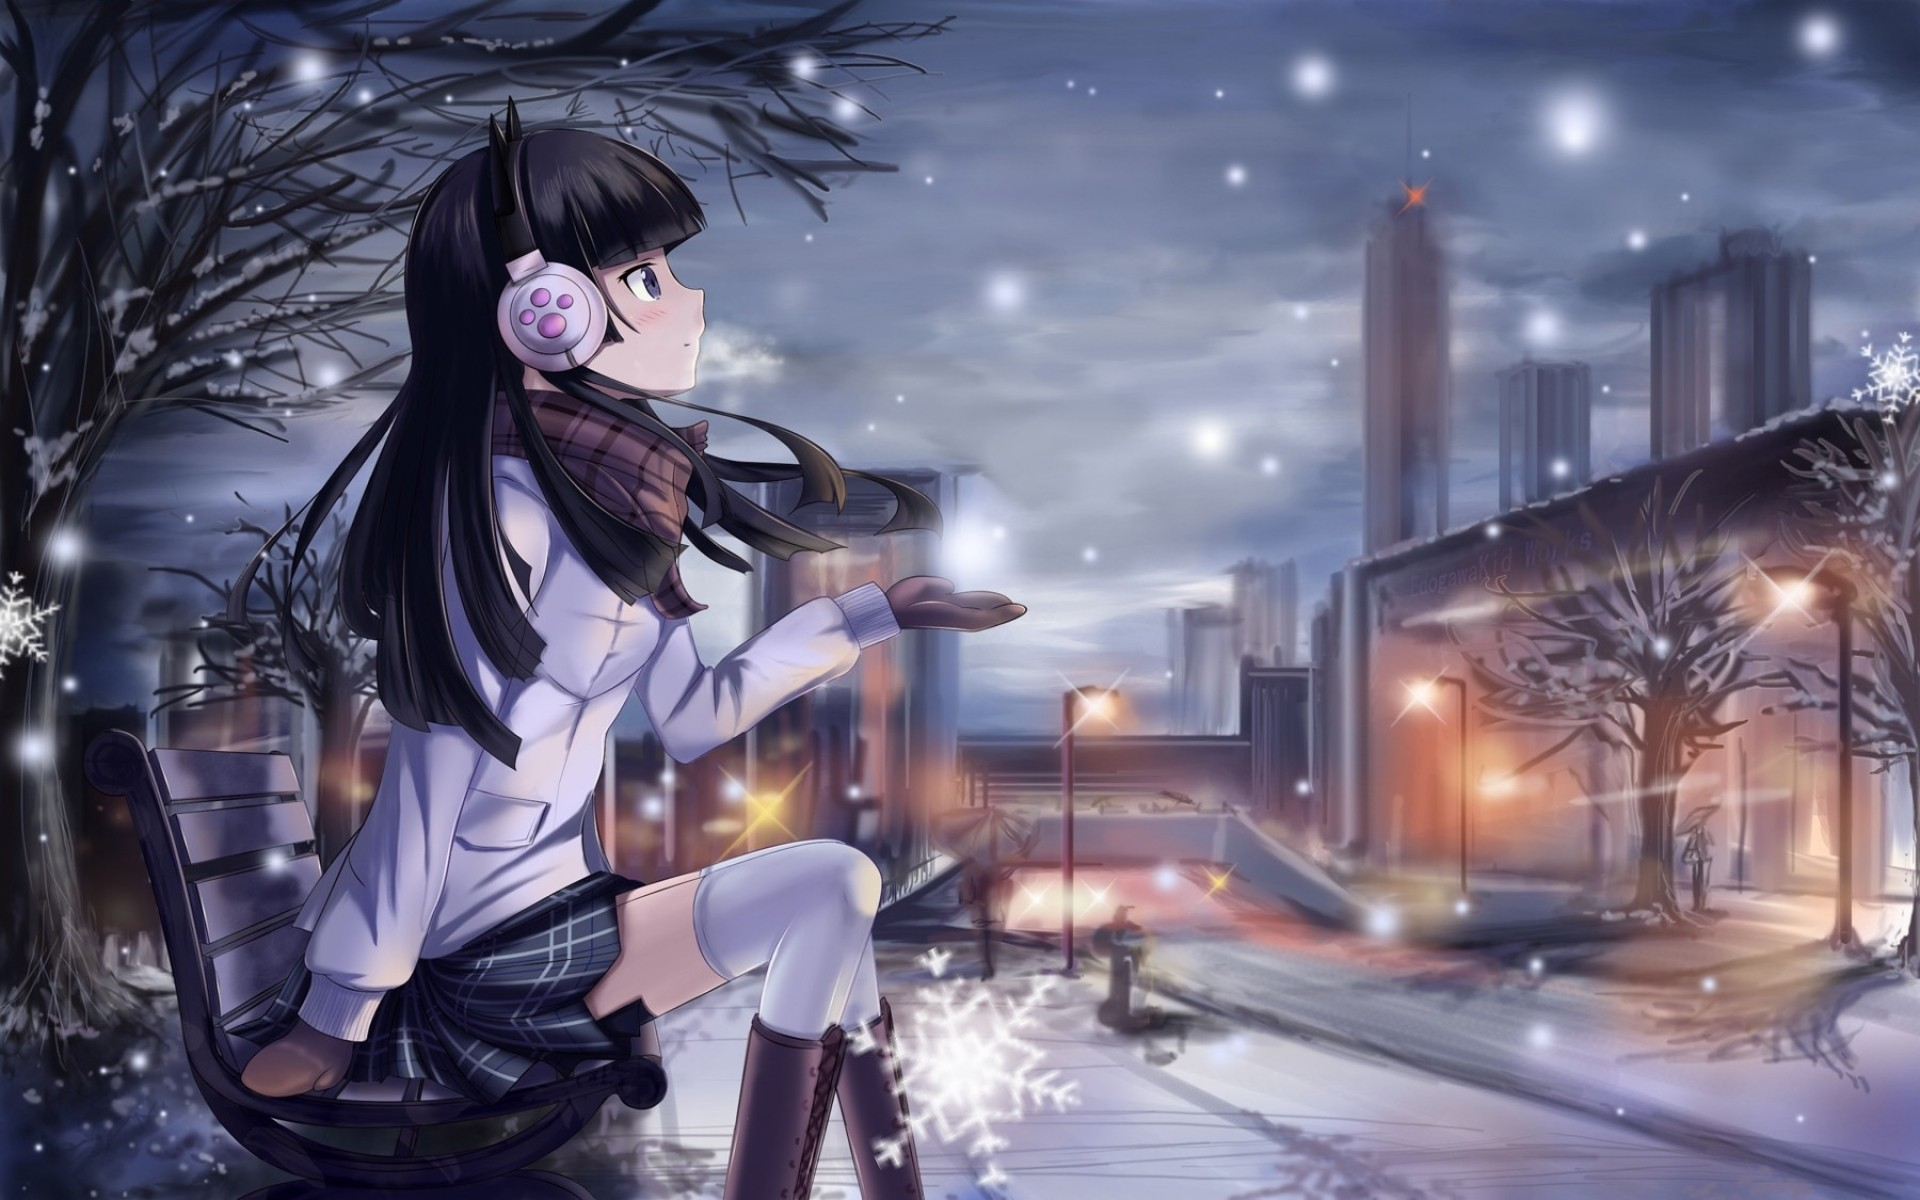 Anime 1920x1200 city headphones anime anime girls snow winter skirt schoolgirl Ore no Imouto ga Konnani Kawaii Wake ga Nai Gokou Ruri manga night bench sitting dark hair snow flakes